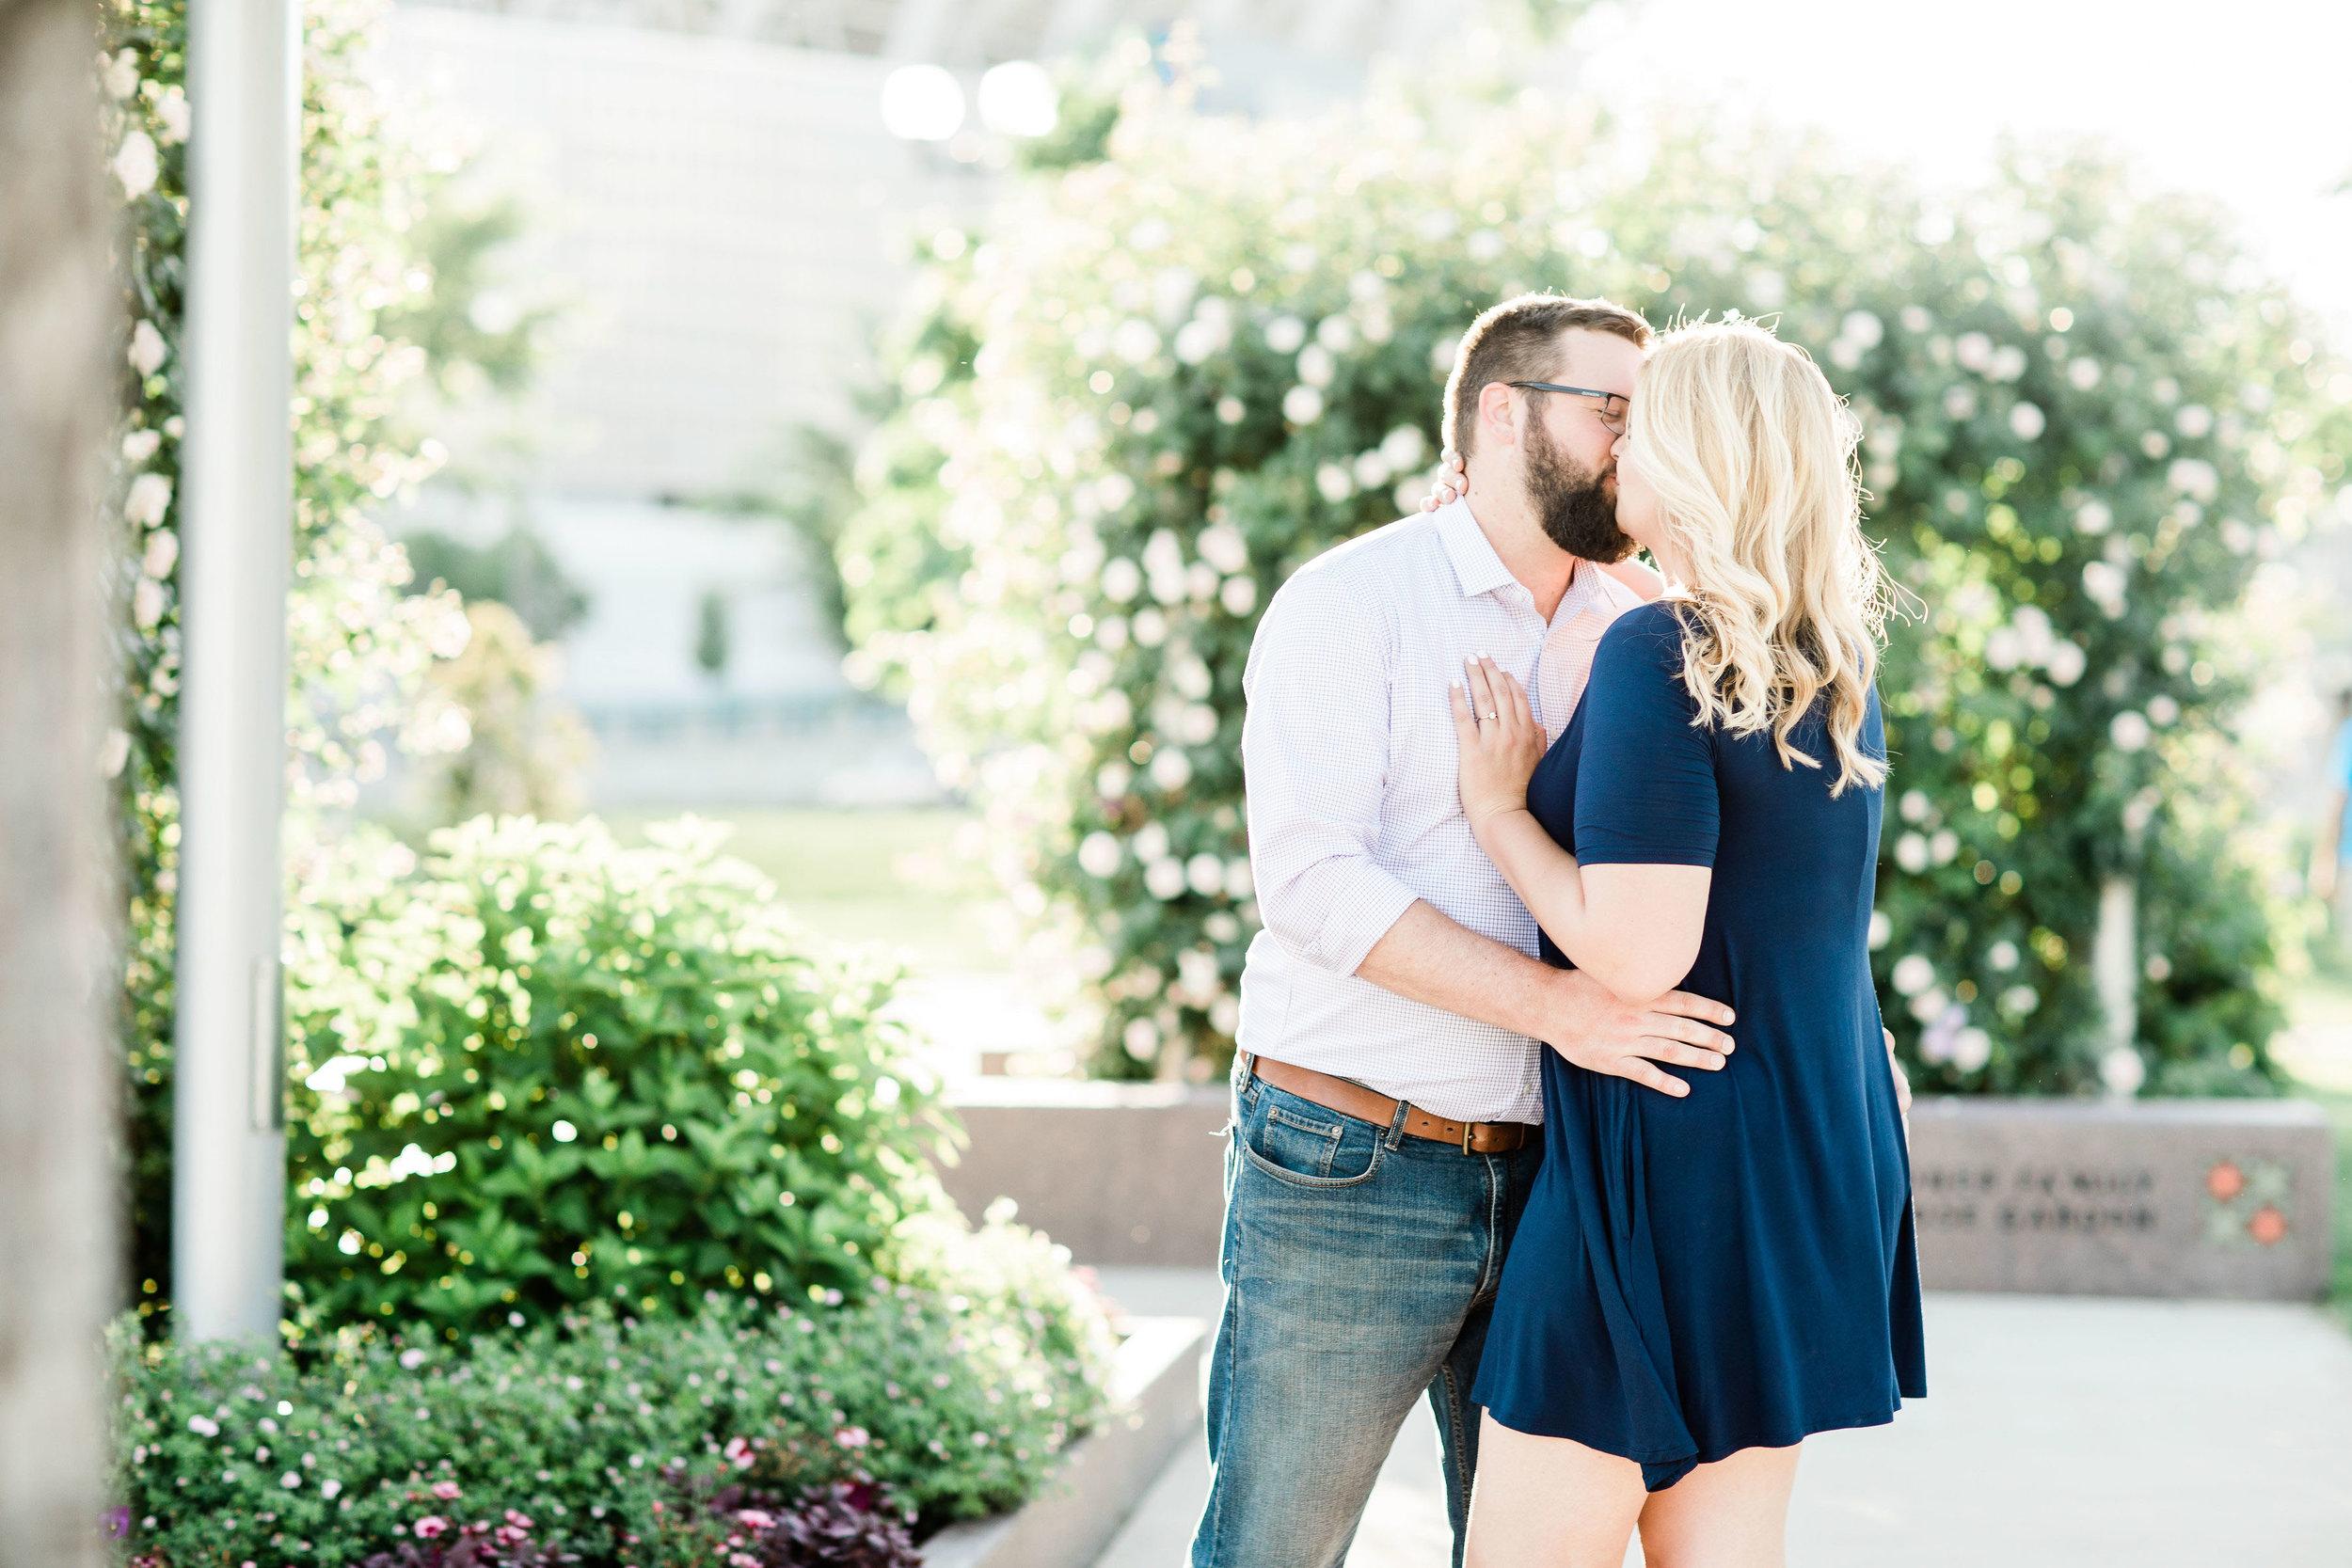 wedding photographer in cincinnati ohio lauren day photography-3.jpg